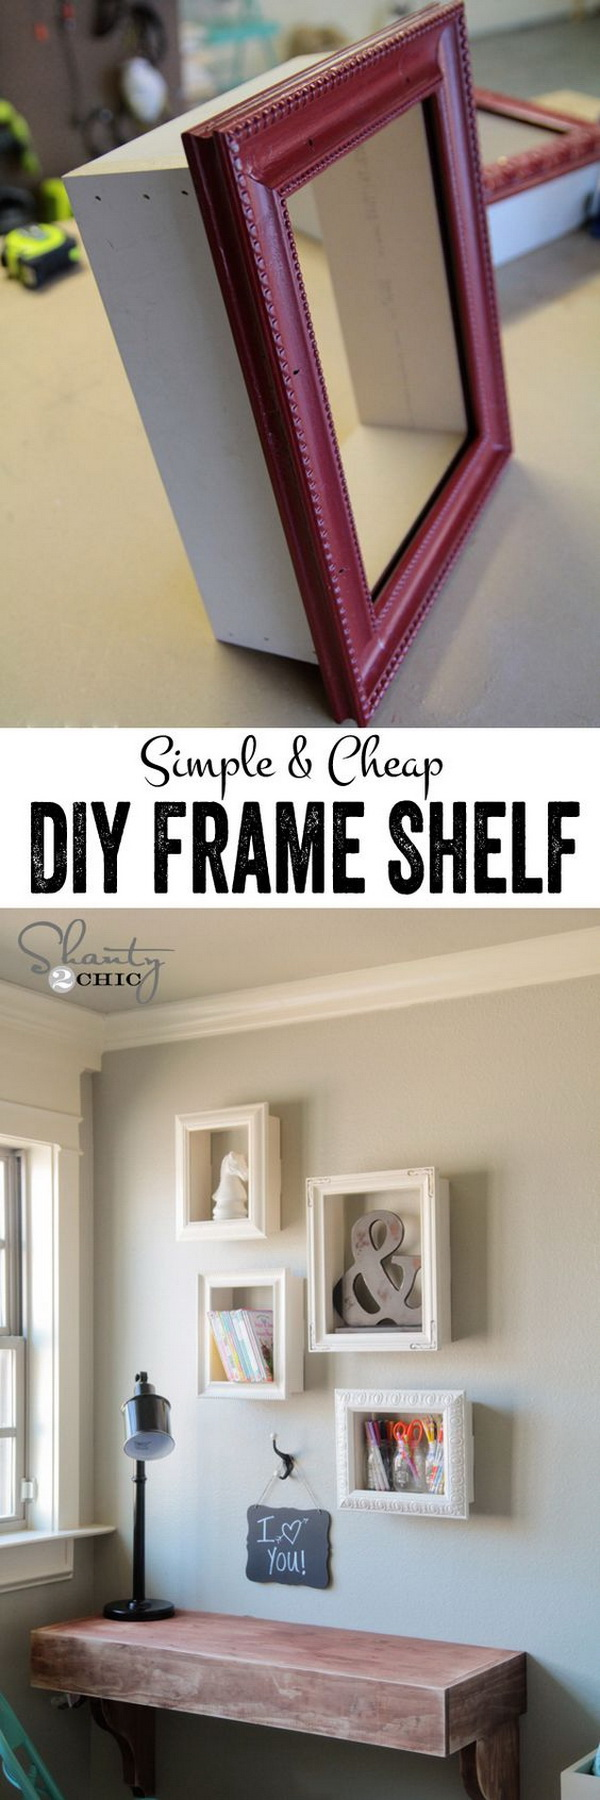 DIY Display Frame Shelves. Make DIY display shelves using cheap frames... So cute and easy!